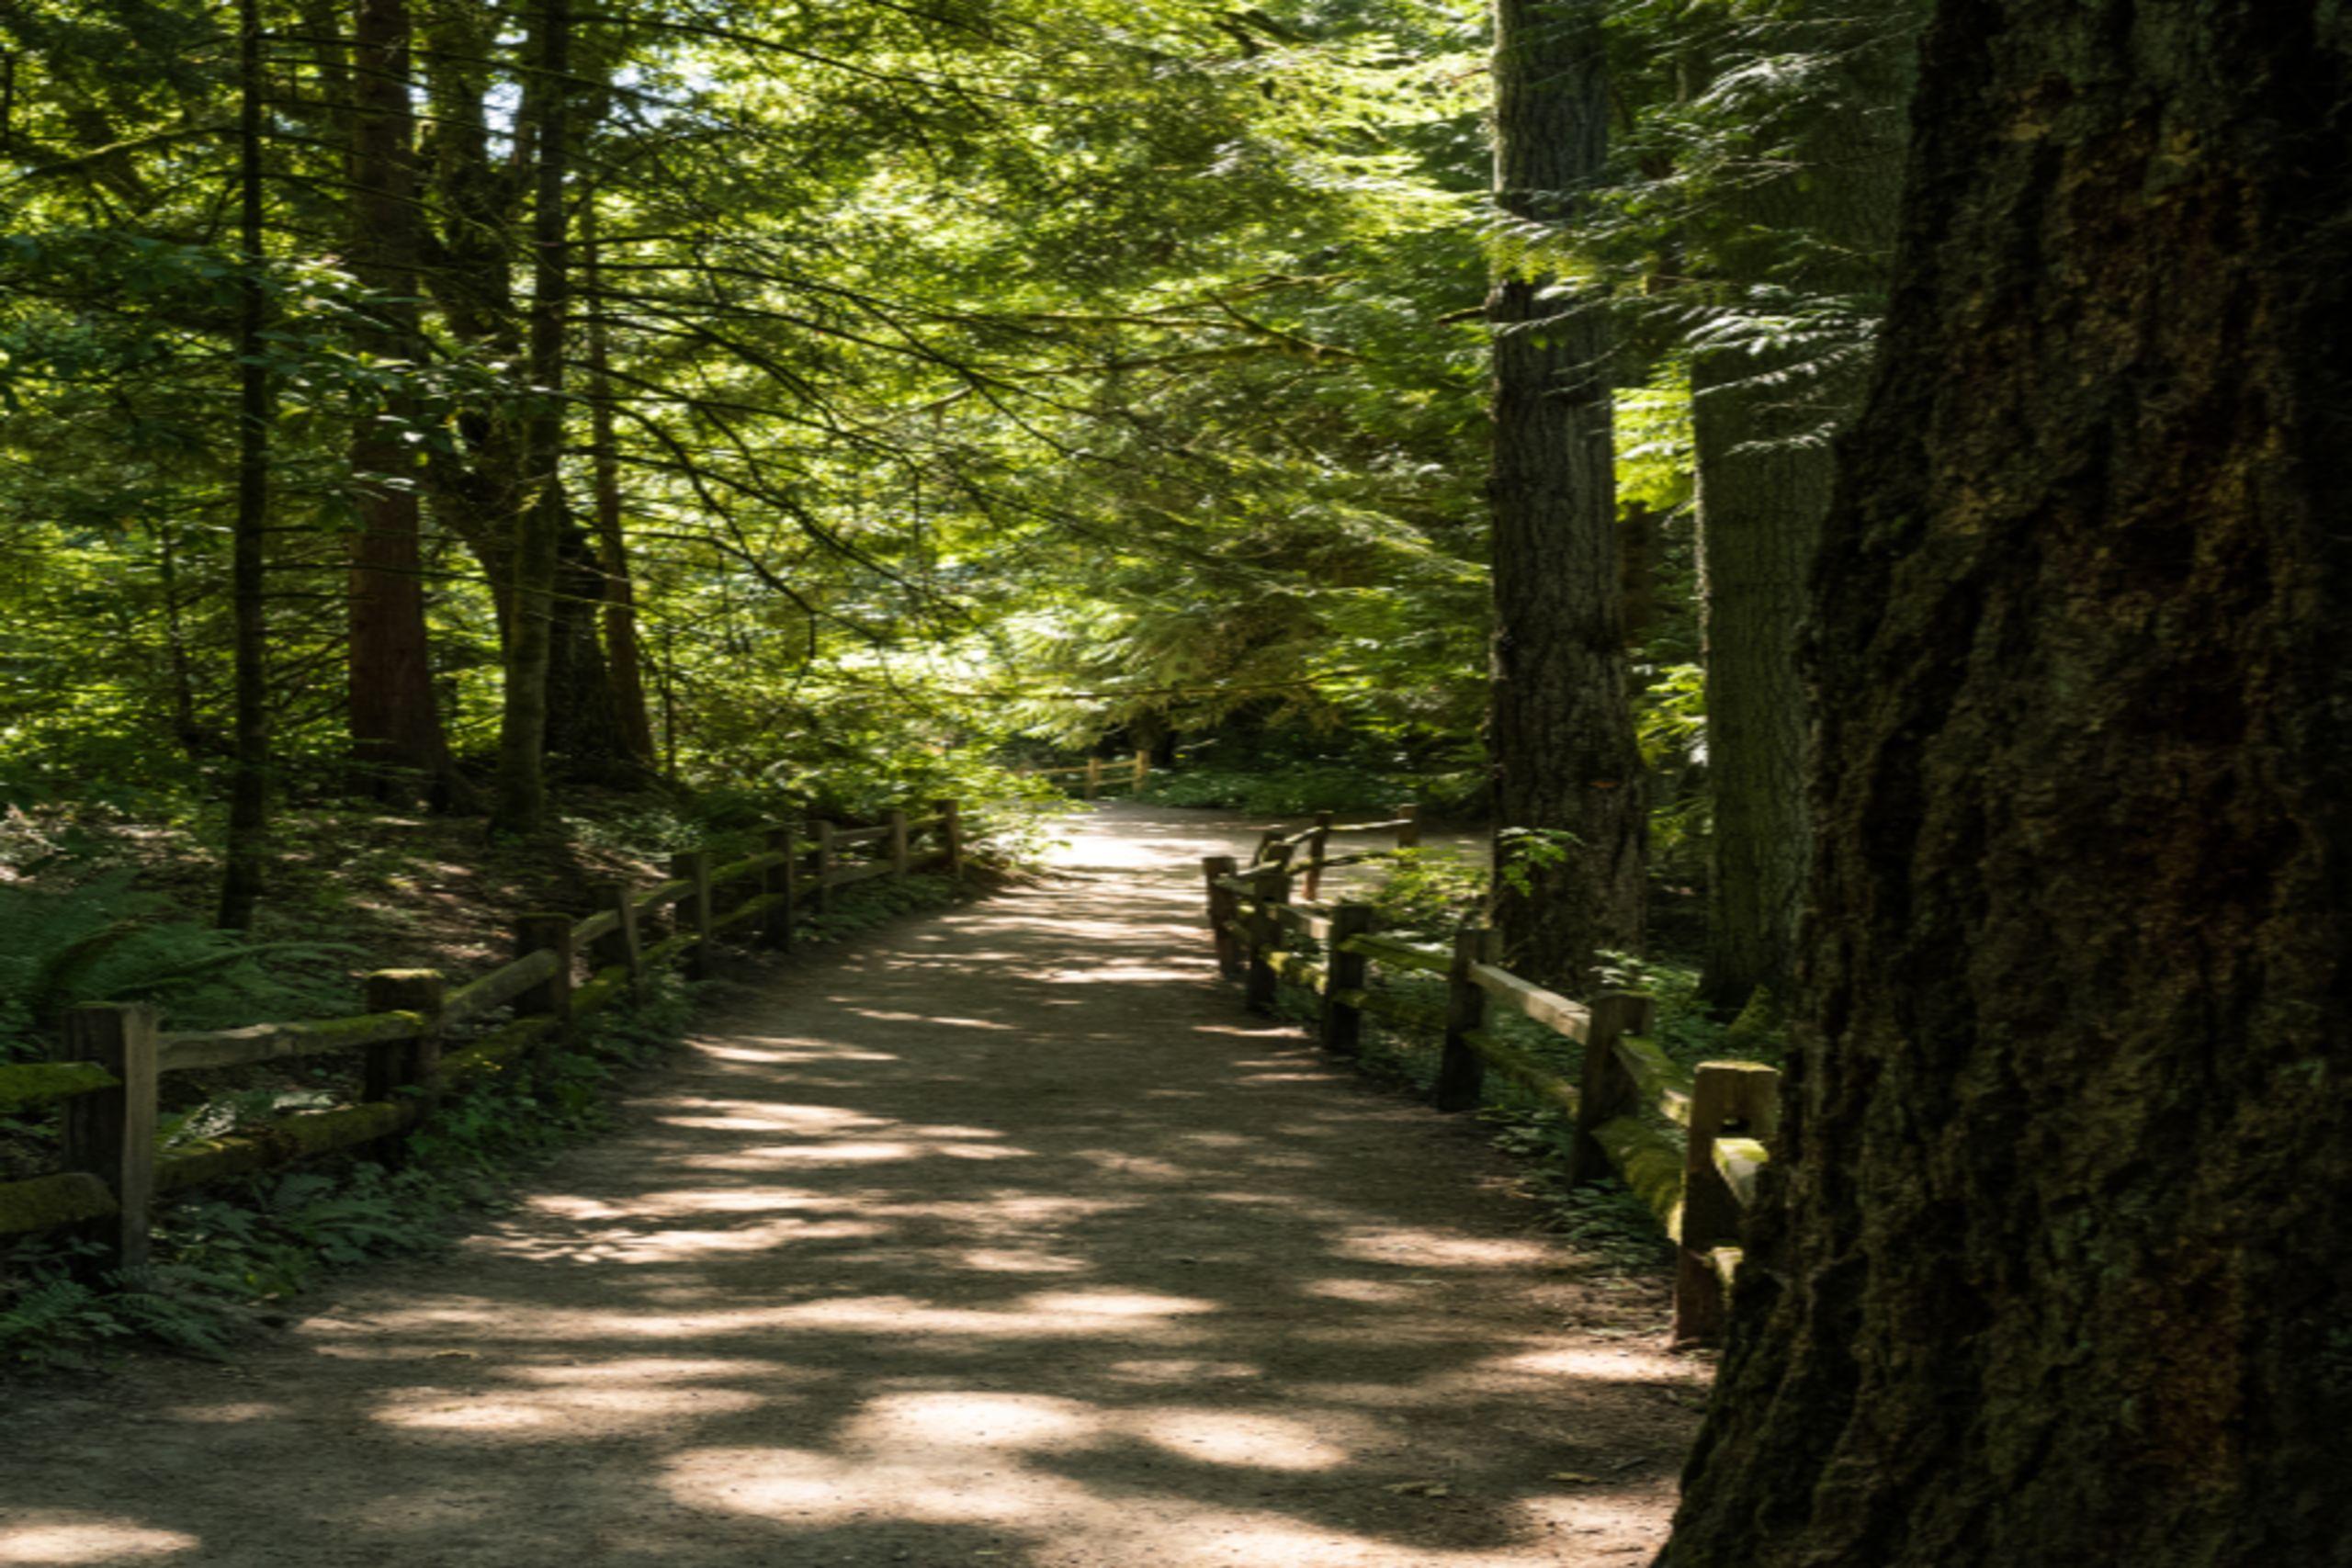 sun dappled trail in forest setting